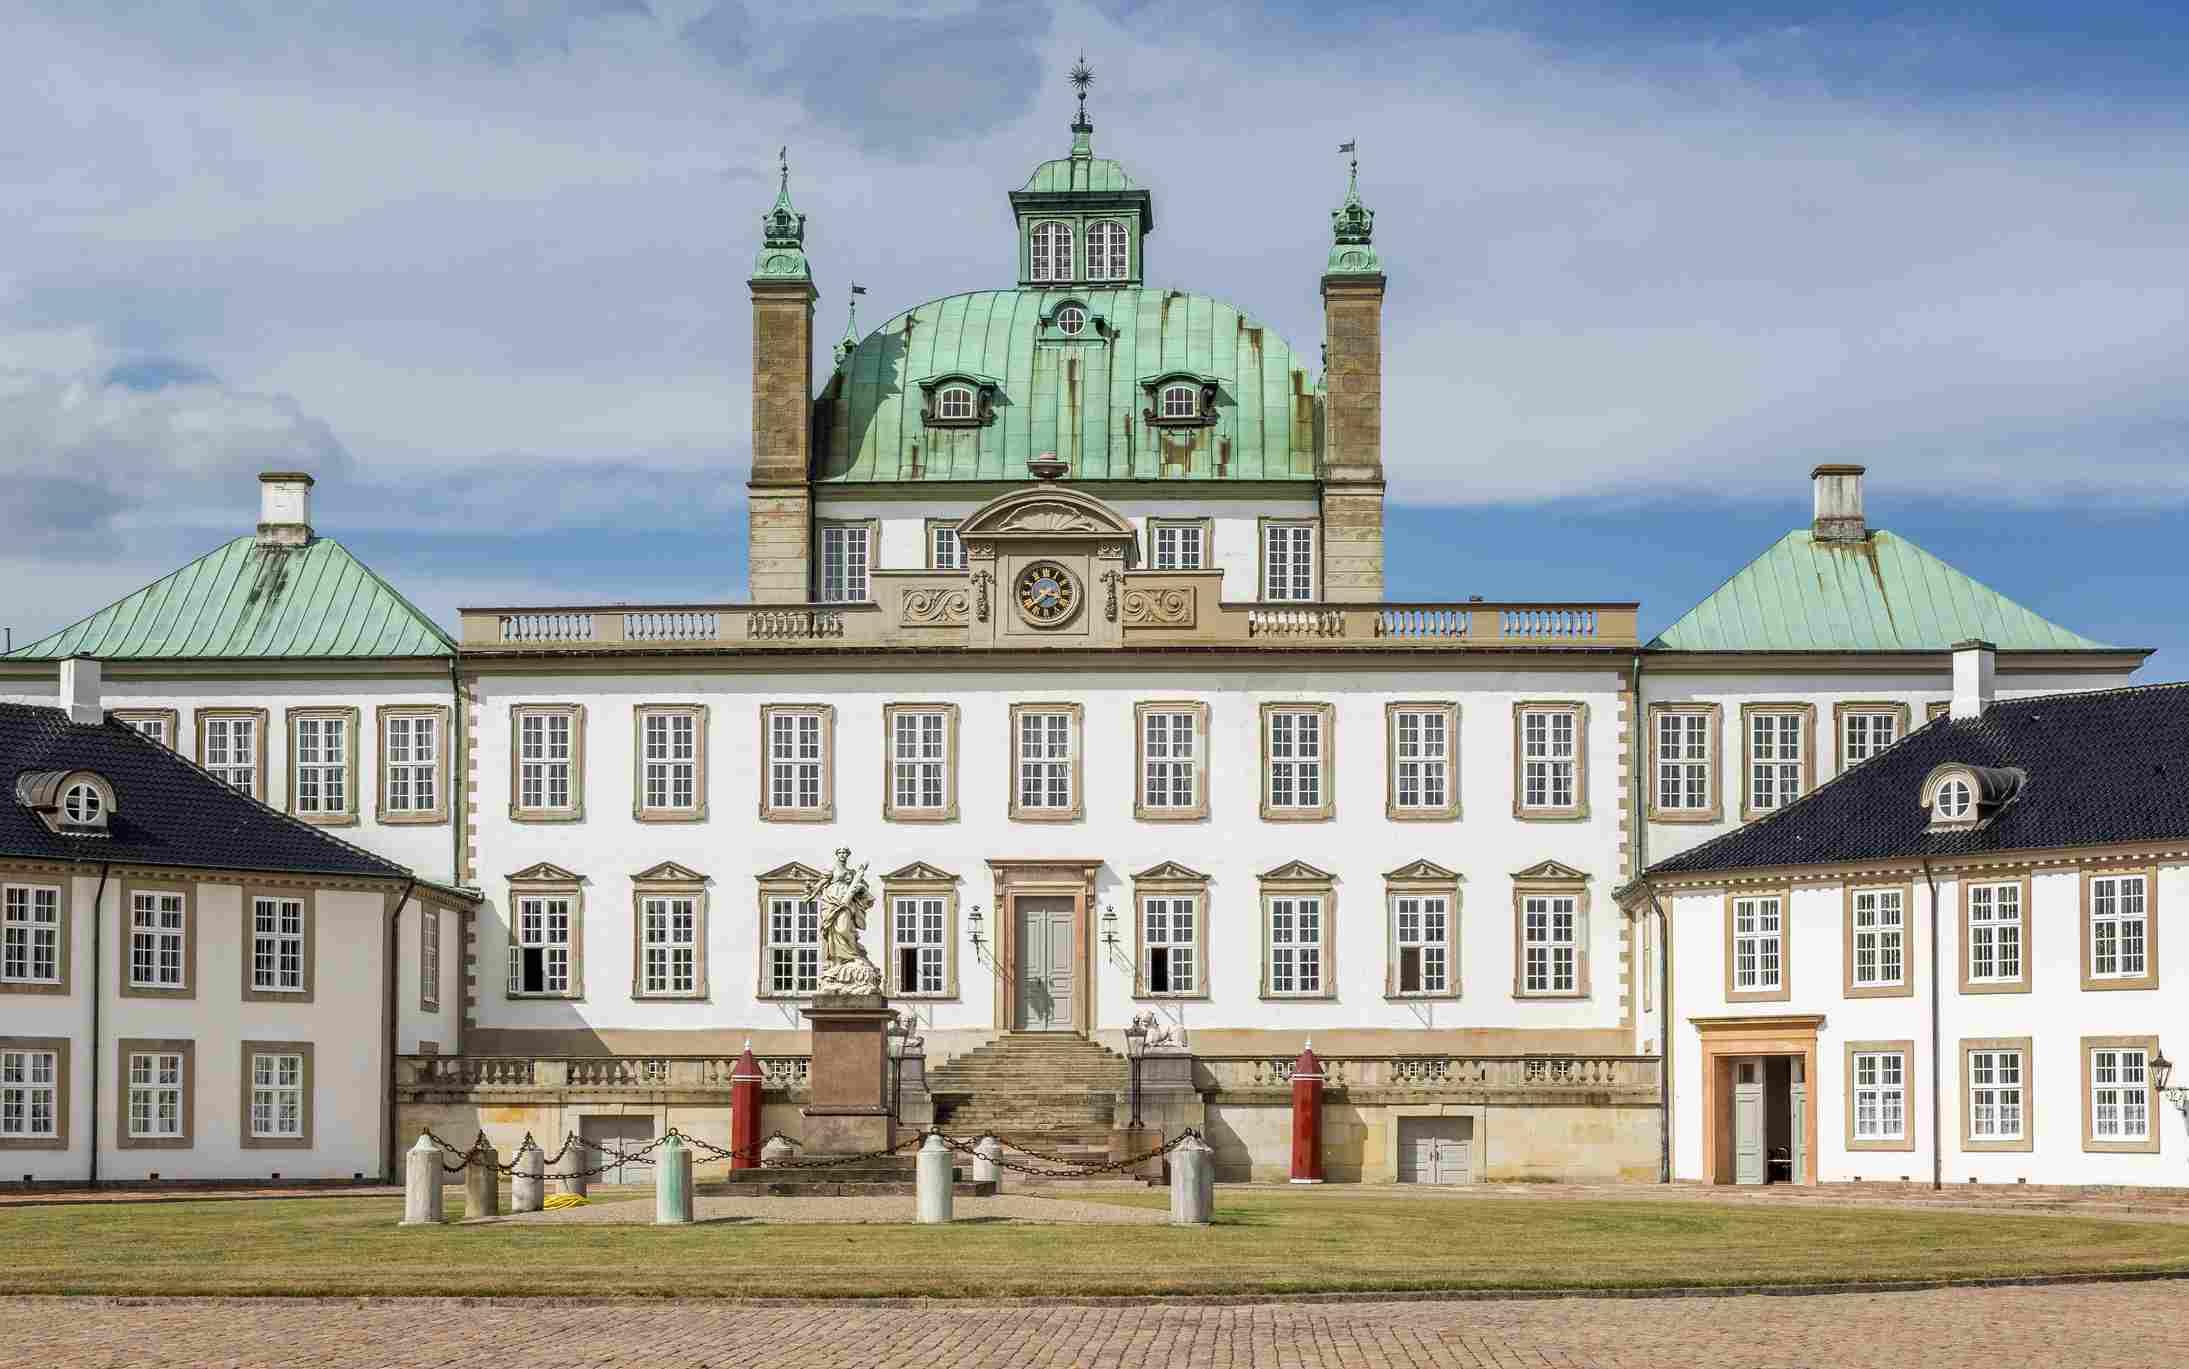 Fredensborg Palace, Fredensborg, Zealand, Denmark, Europe